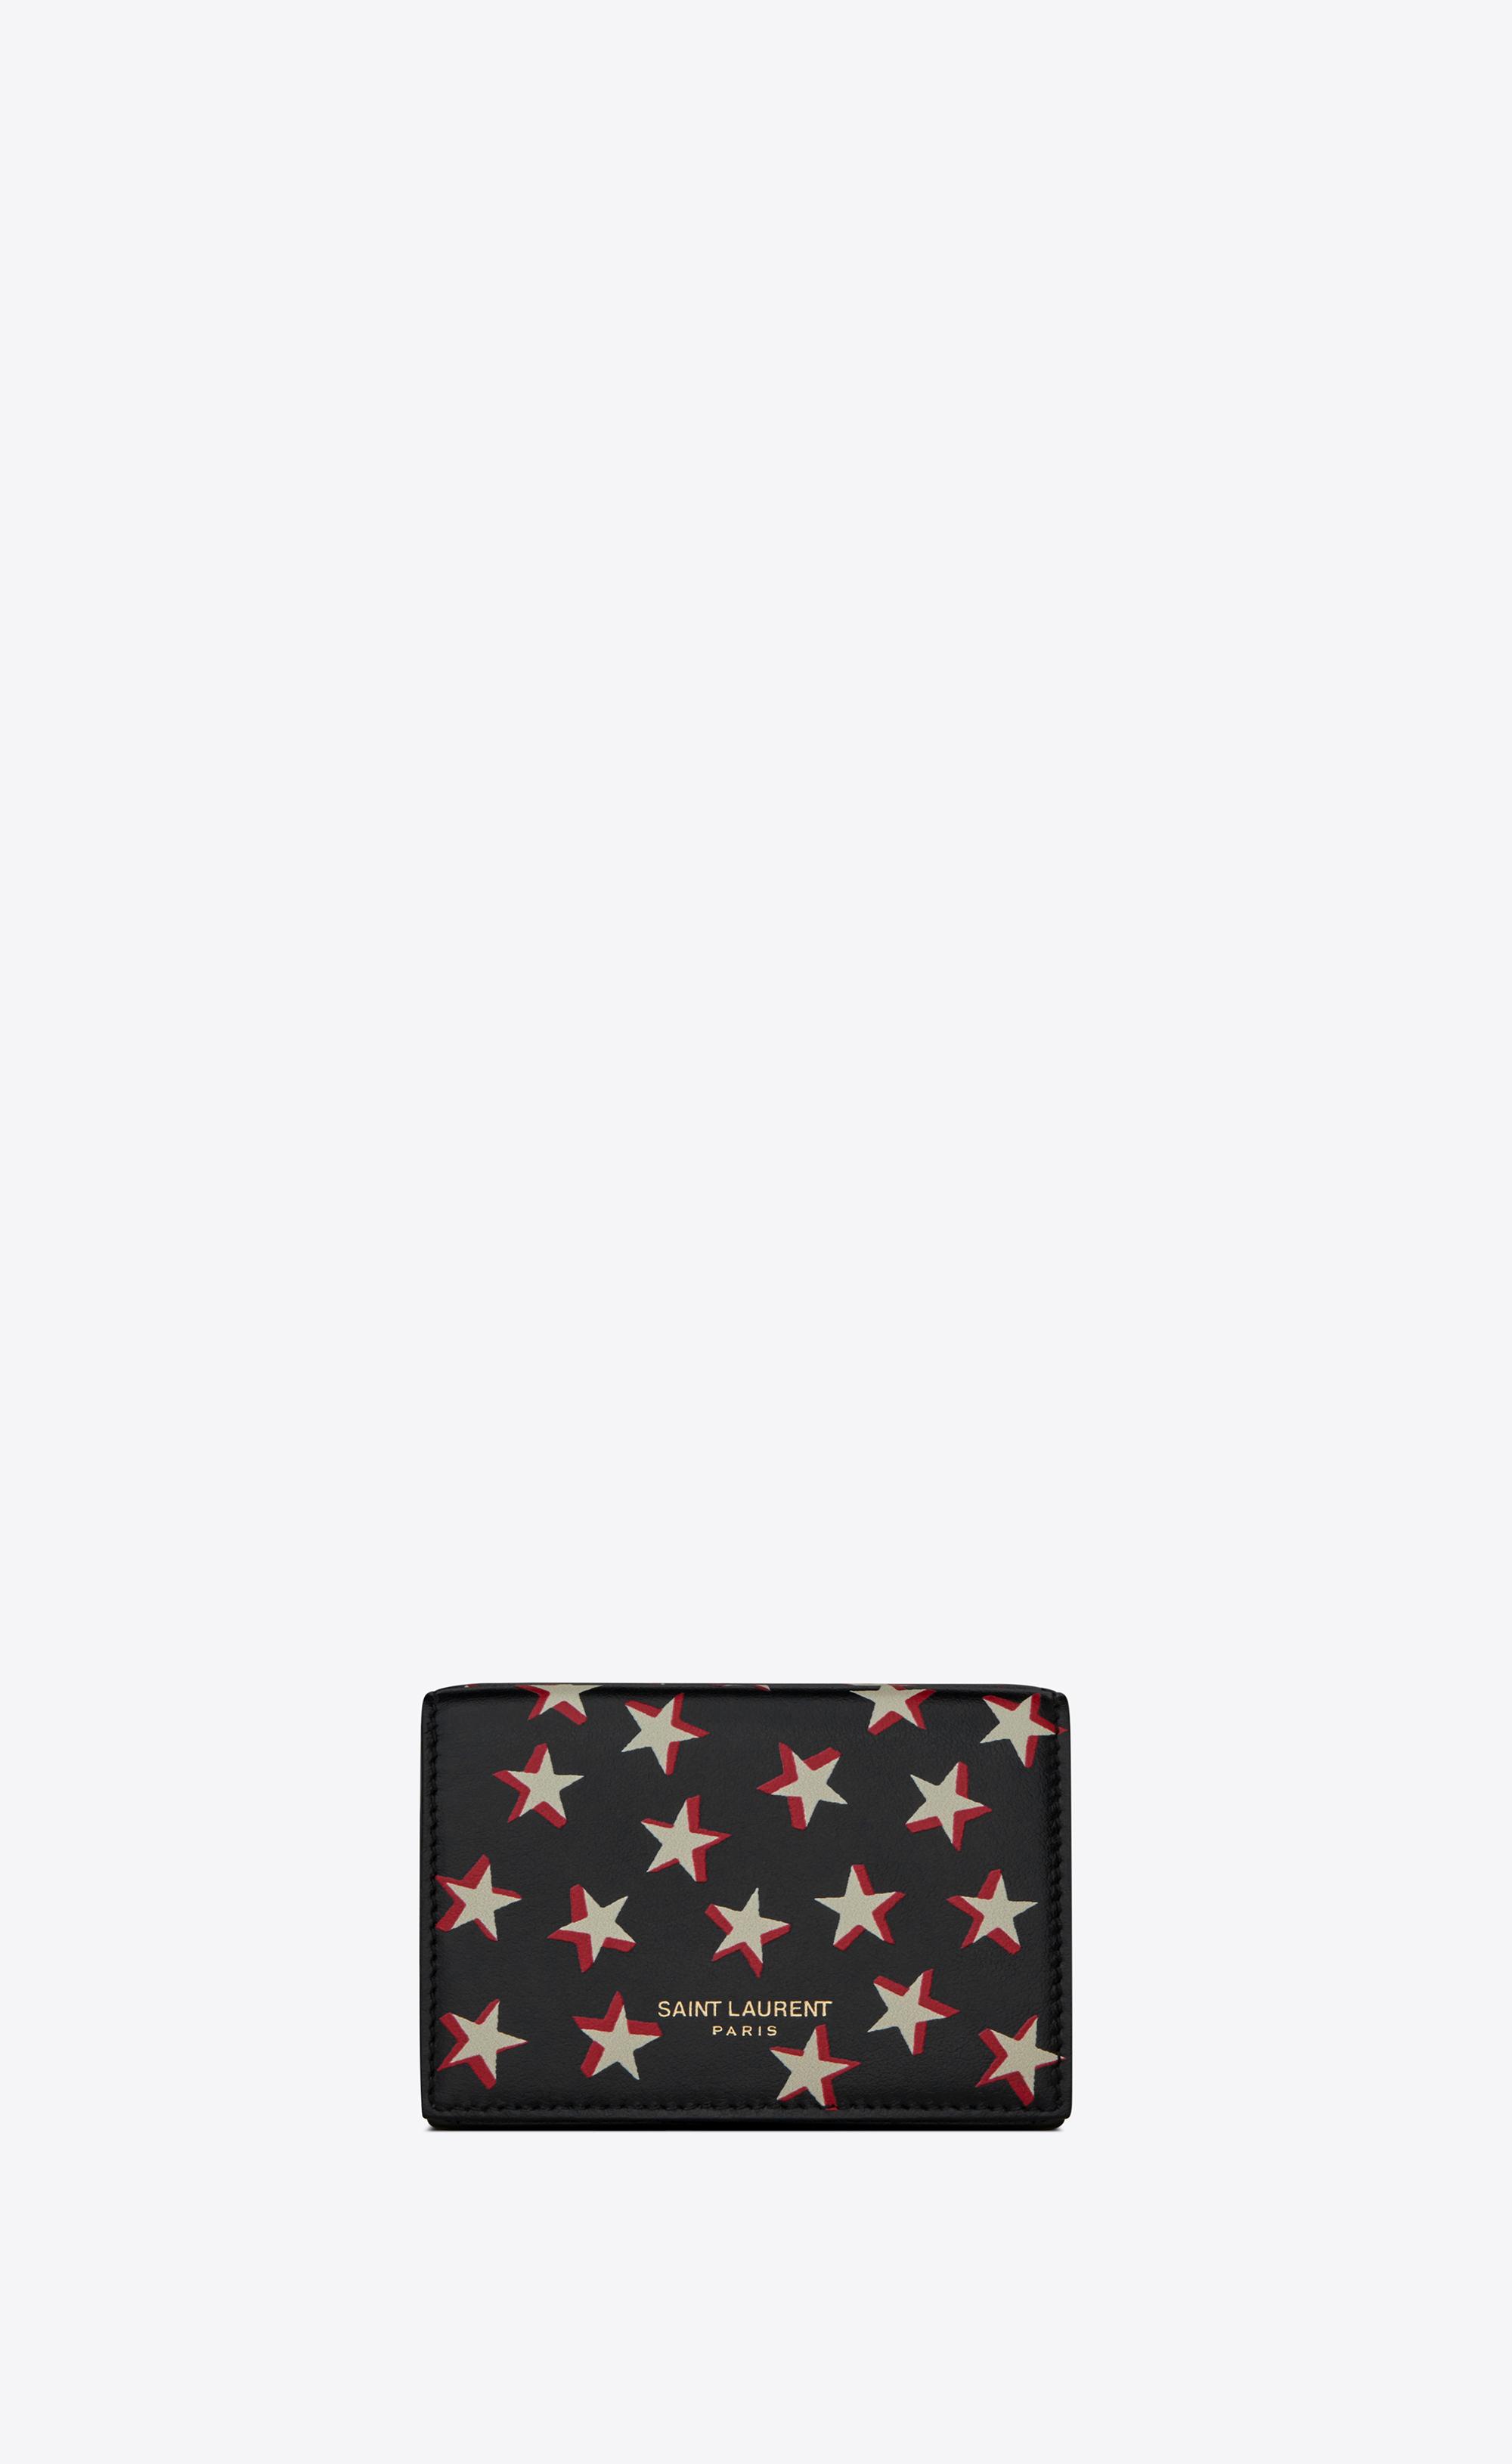 85eba4e150e SAINT LAURENT   Slp Animation Tiny Wallet In Star Print Leather Black  Onesize   Goxip